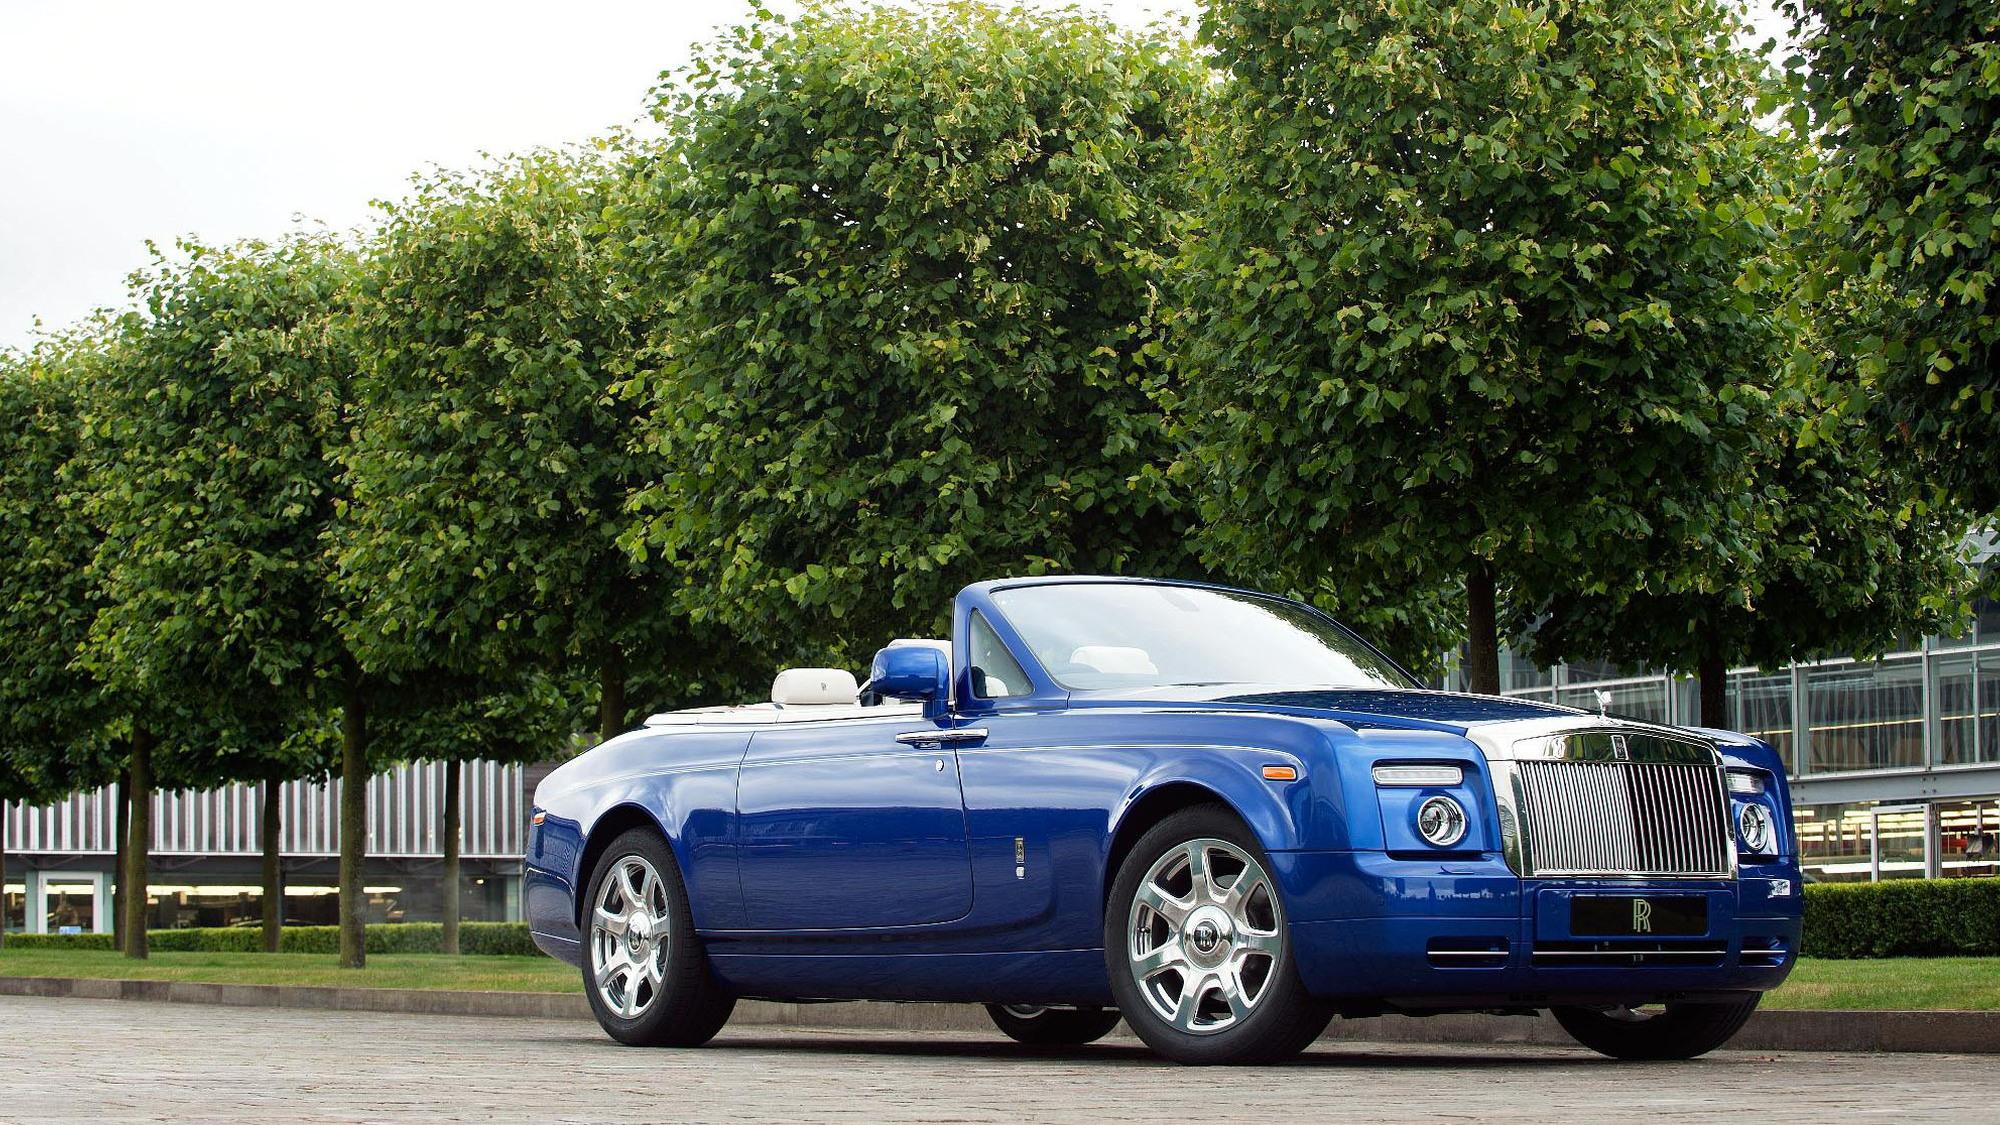 Rolls-Royce Masterpiece London 2011 Drophead Coupe